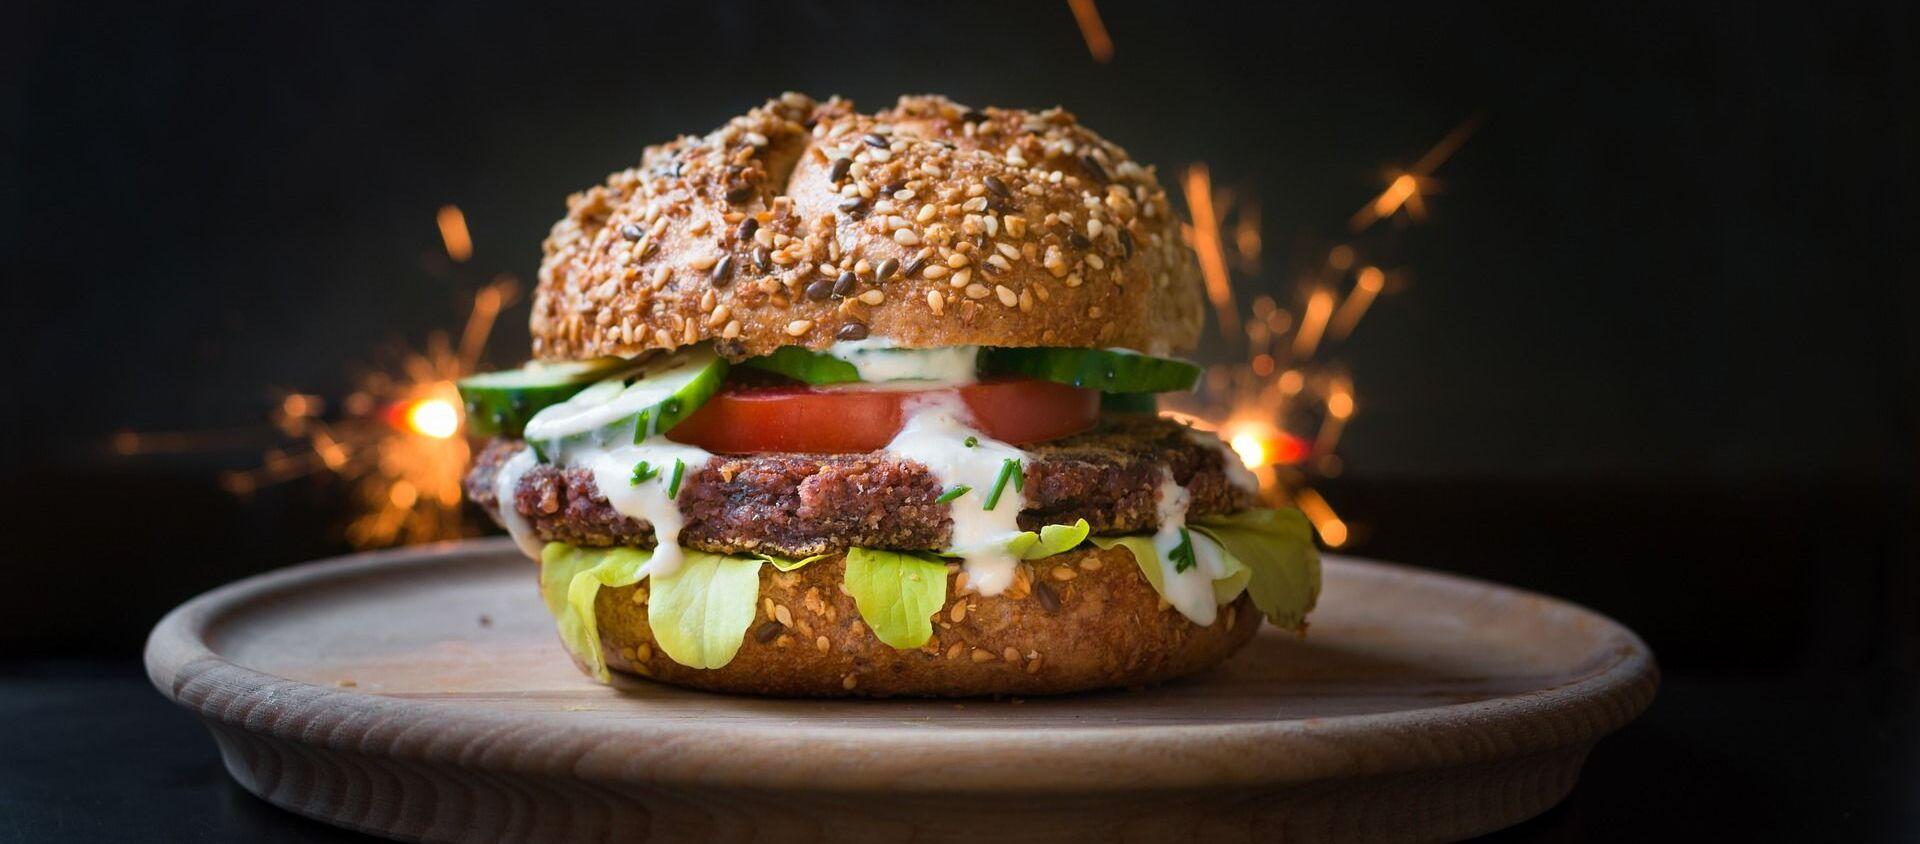 Una hamburguesa vegetariana - Sputnik Mundo, 1920, 09.12.2019